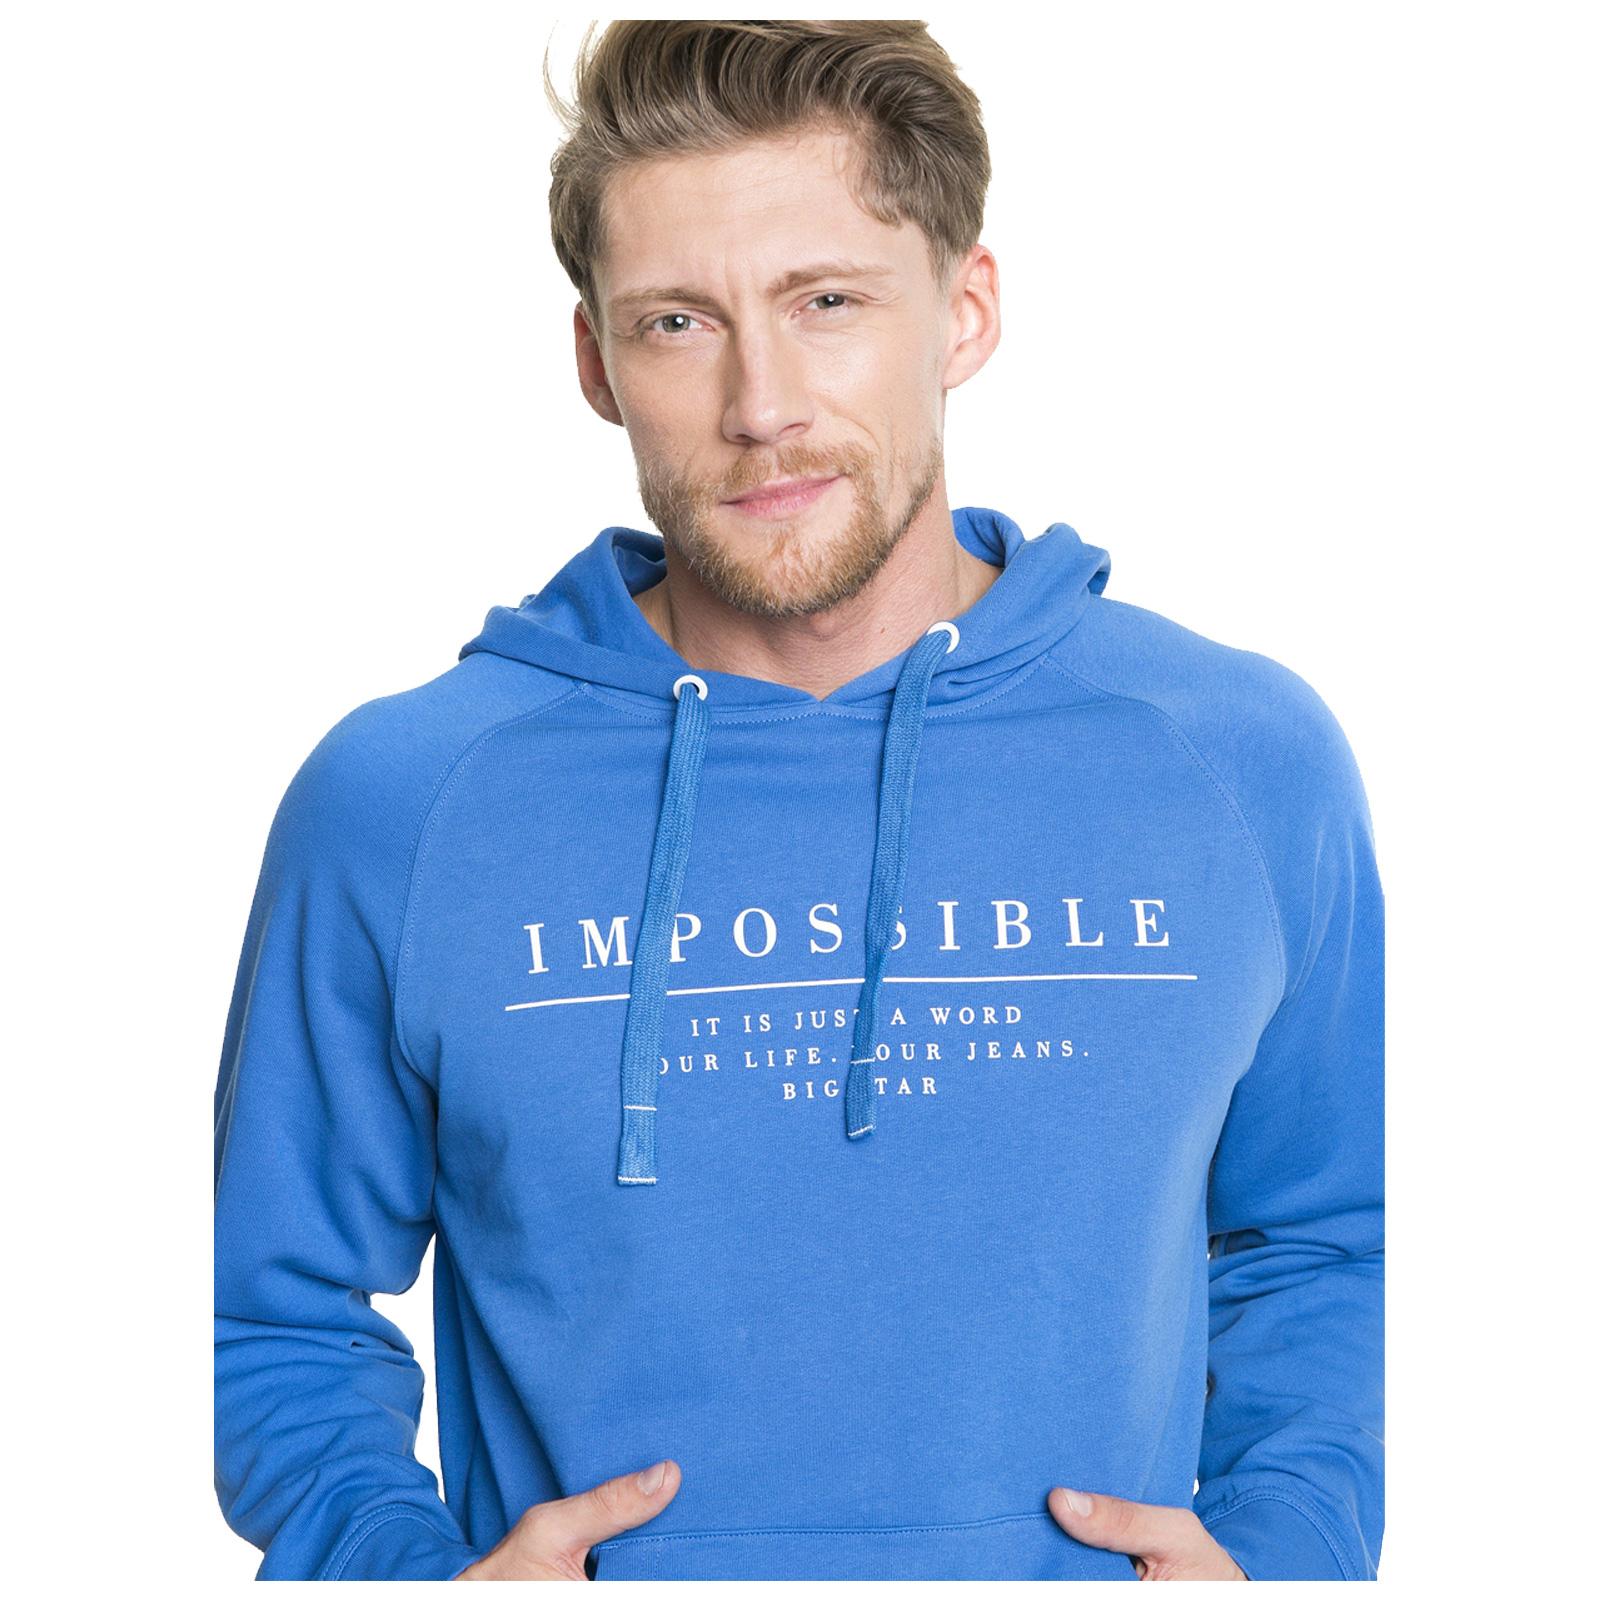 Big-Star-Mens-Hoodie-New-Cotton-Pullover-Full-Zip-Hooded-Casual-Sweatshirt thumbnail 4